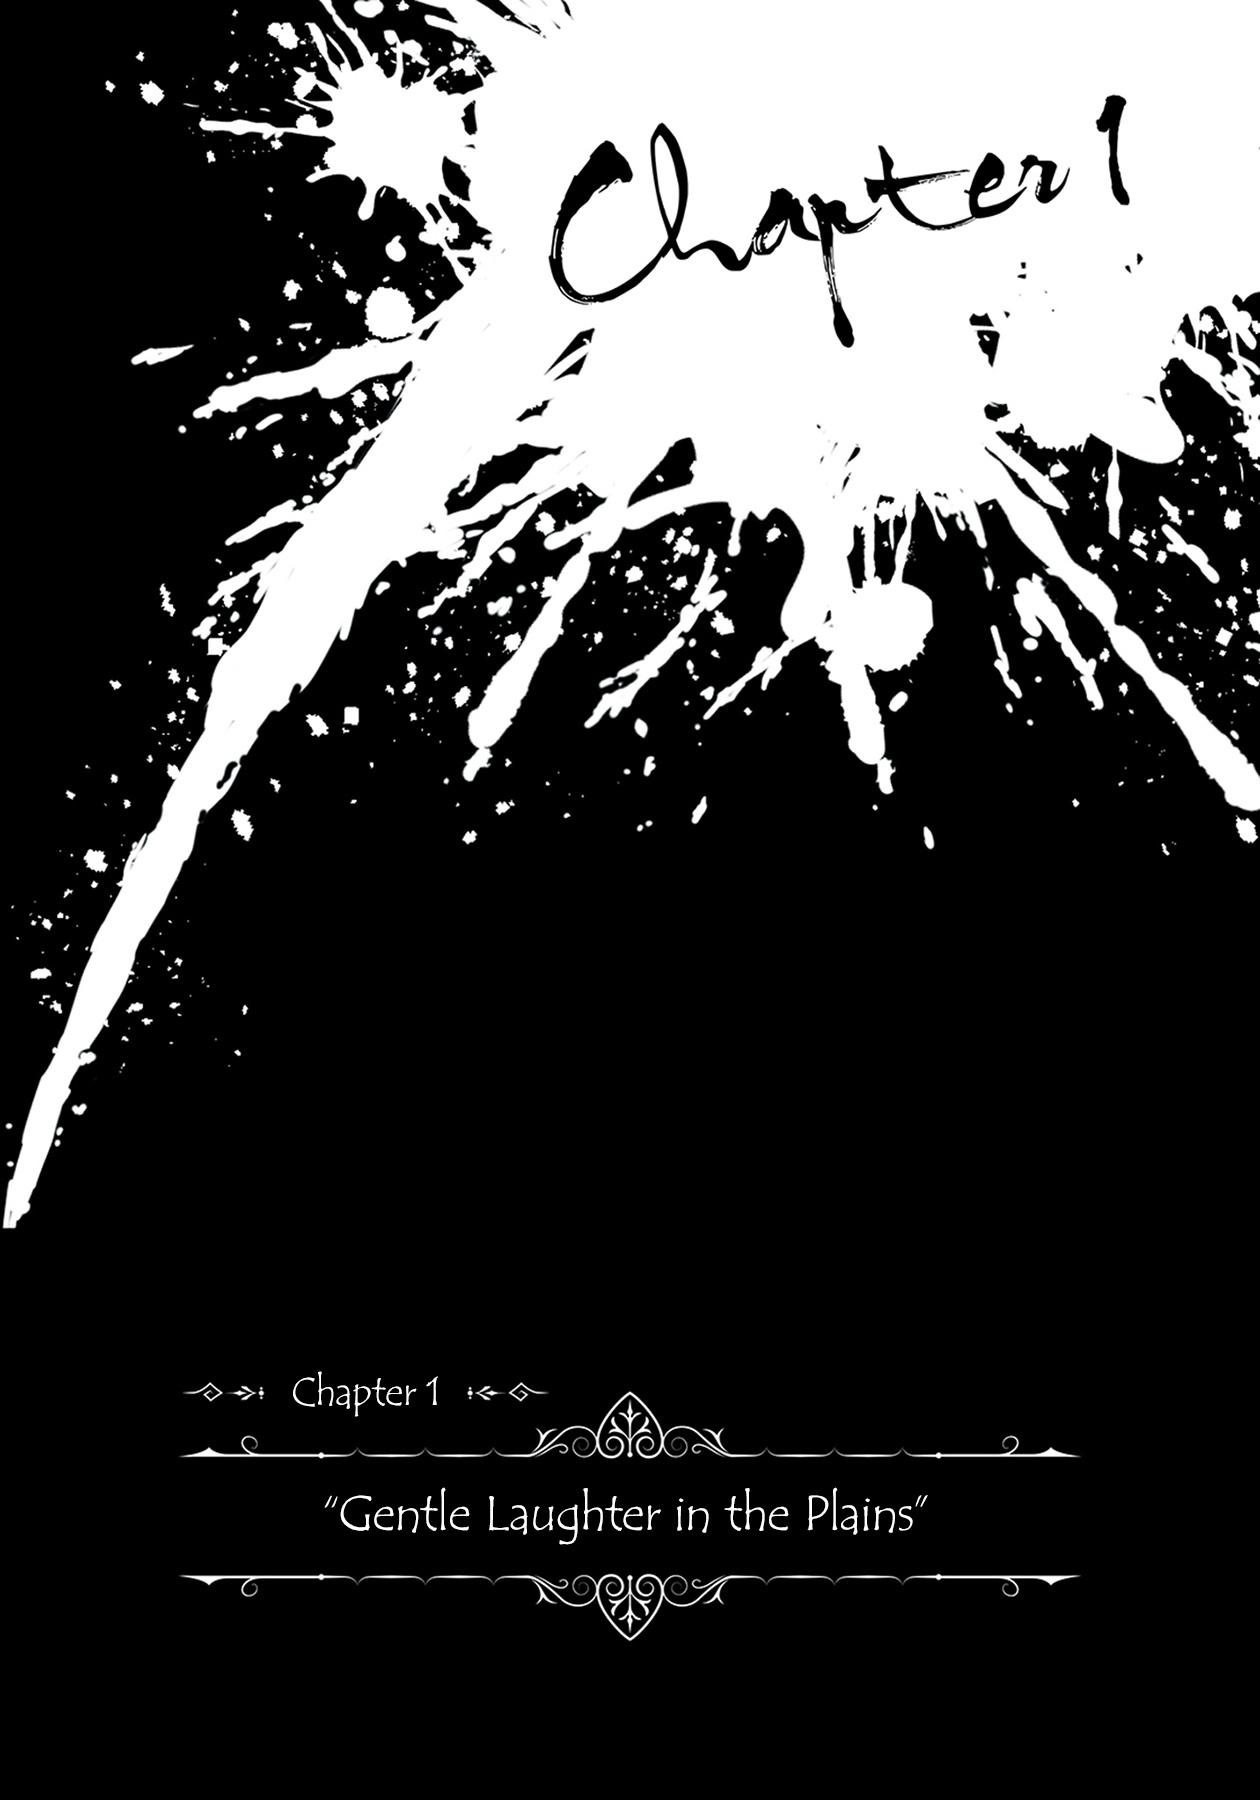 Elvenblood - Vol 1 Chapter 1